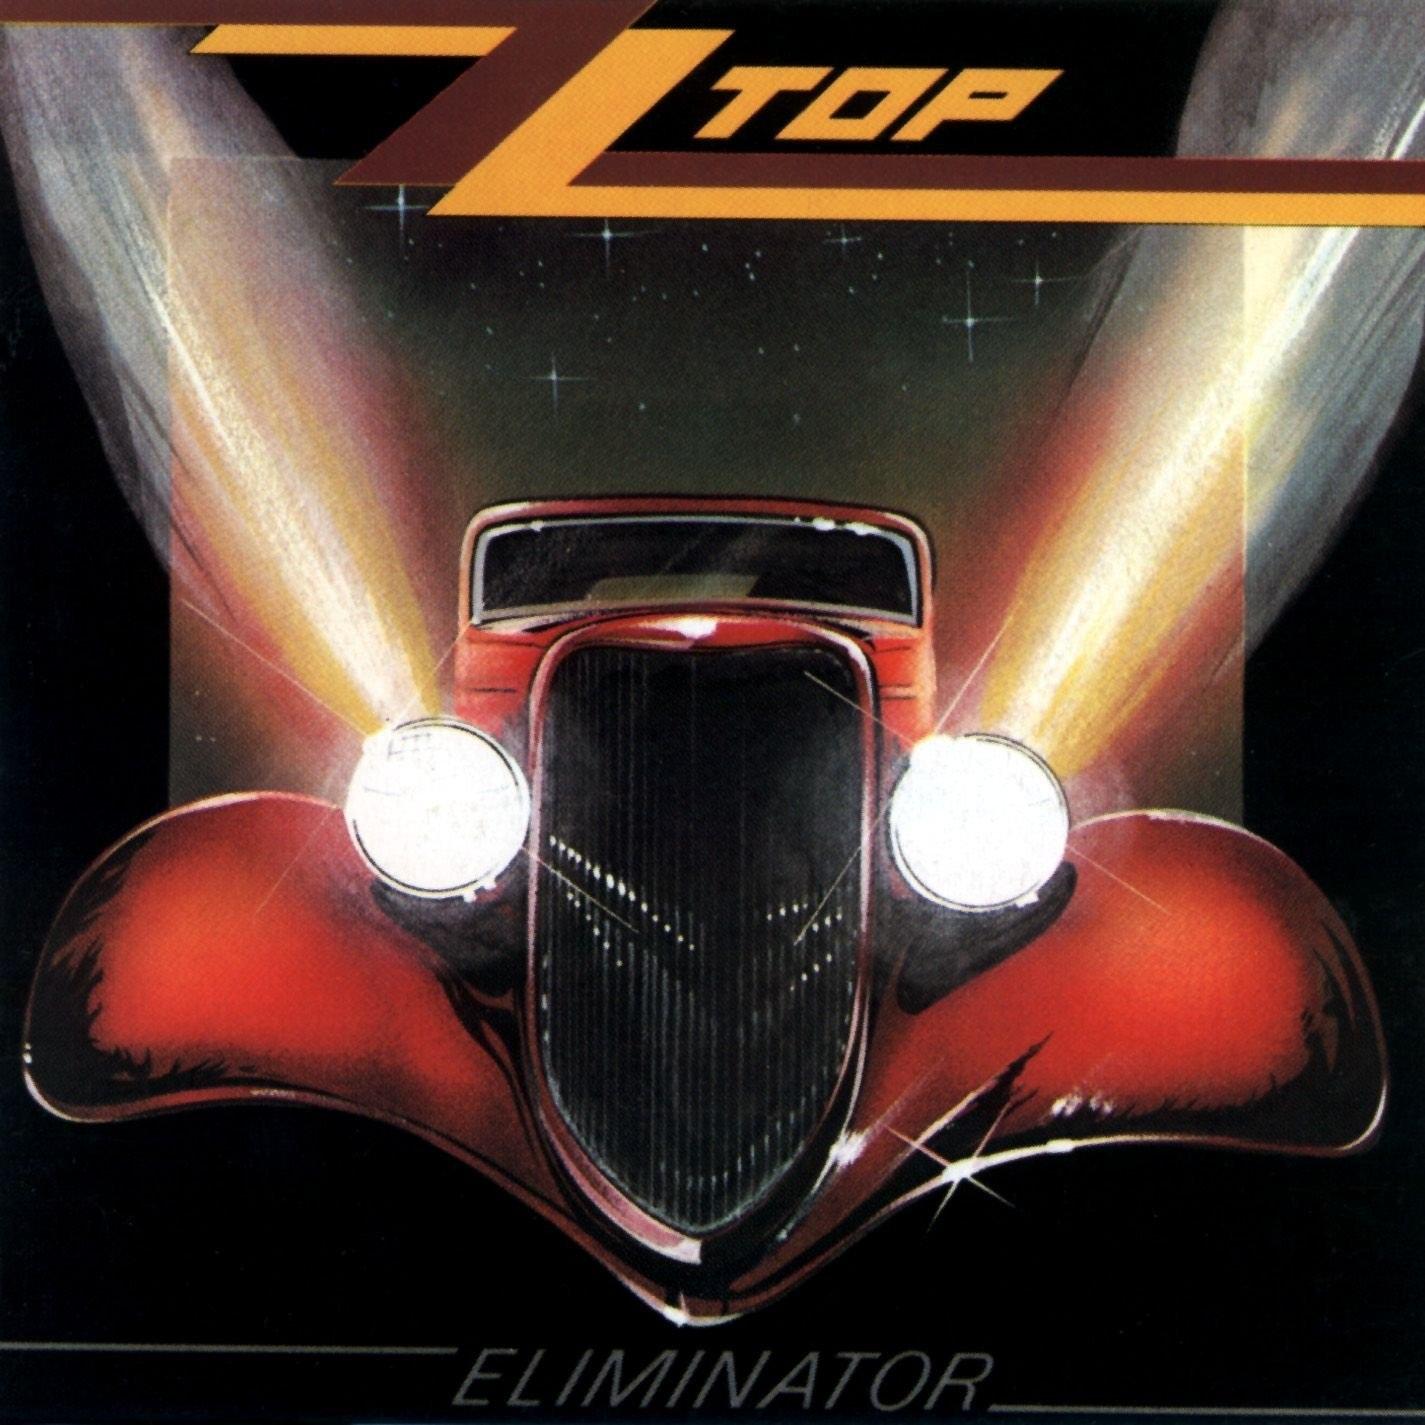 Zz Top: Eliminator (LP) zz top zz top afterburner eliminator 2 cd